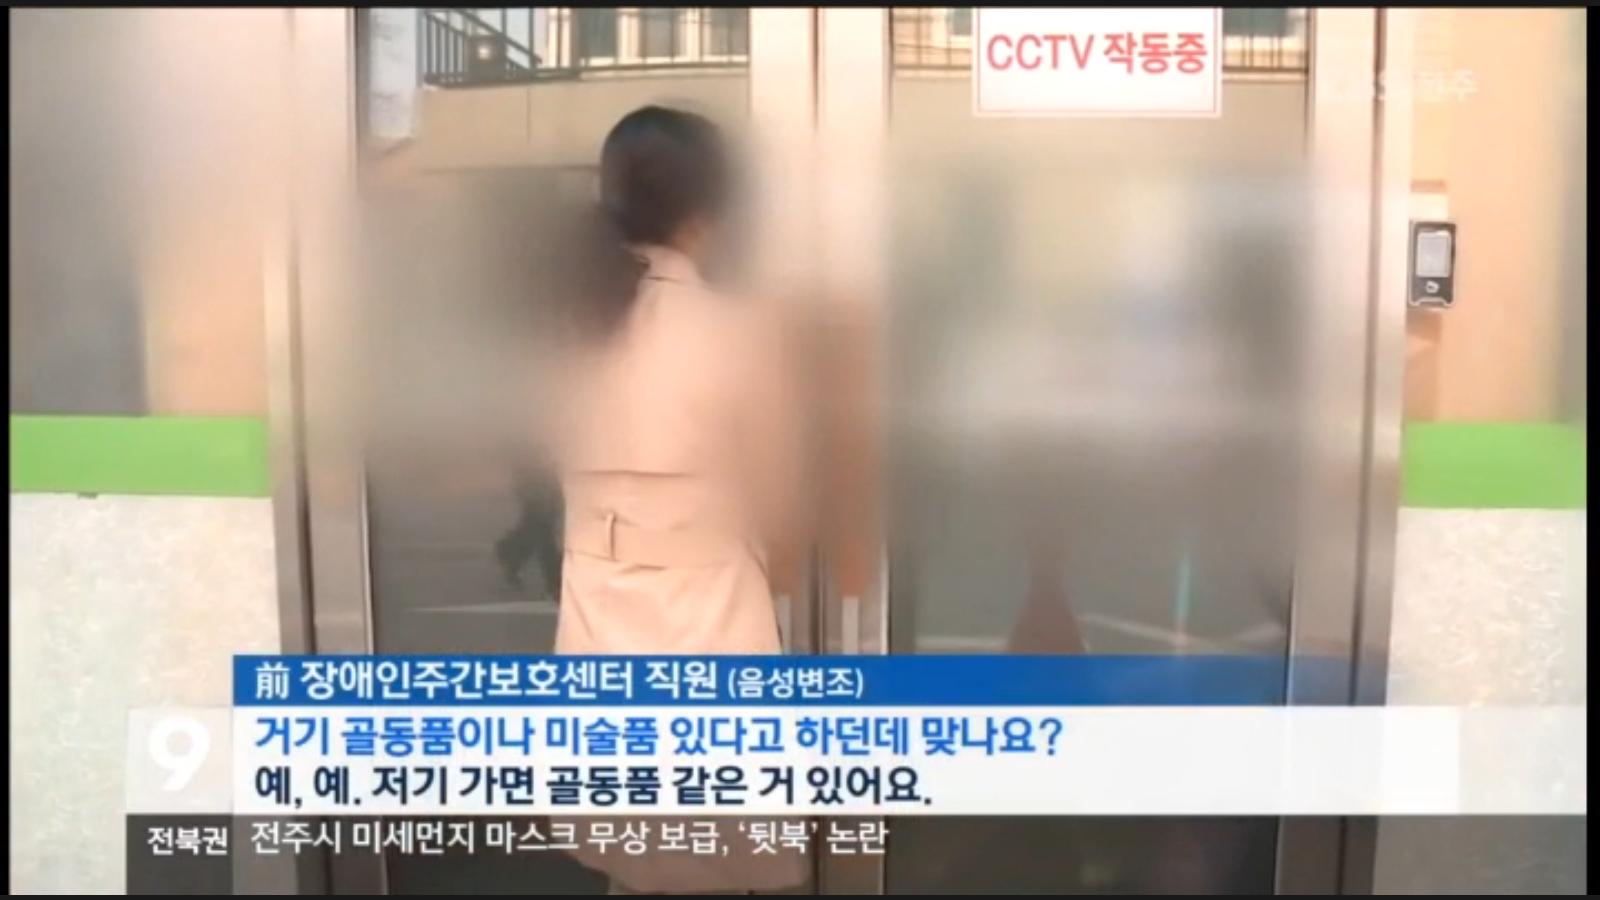 [18.3.30 KBS전주] 전주 봉침게이트, 재산 형성은..후원금검찰 사건축소..재수사 해야7.jpg